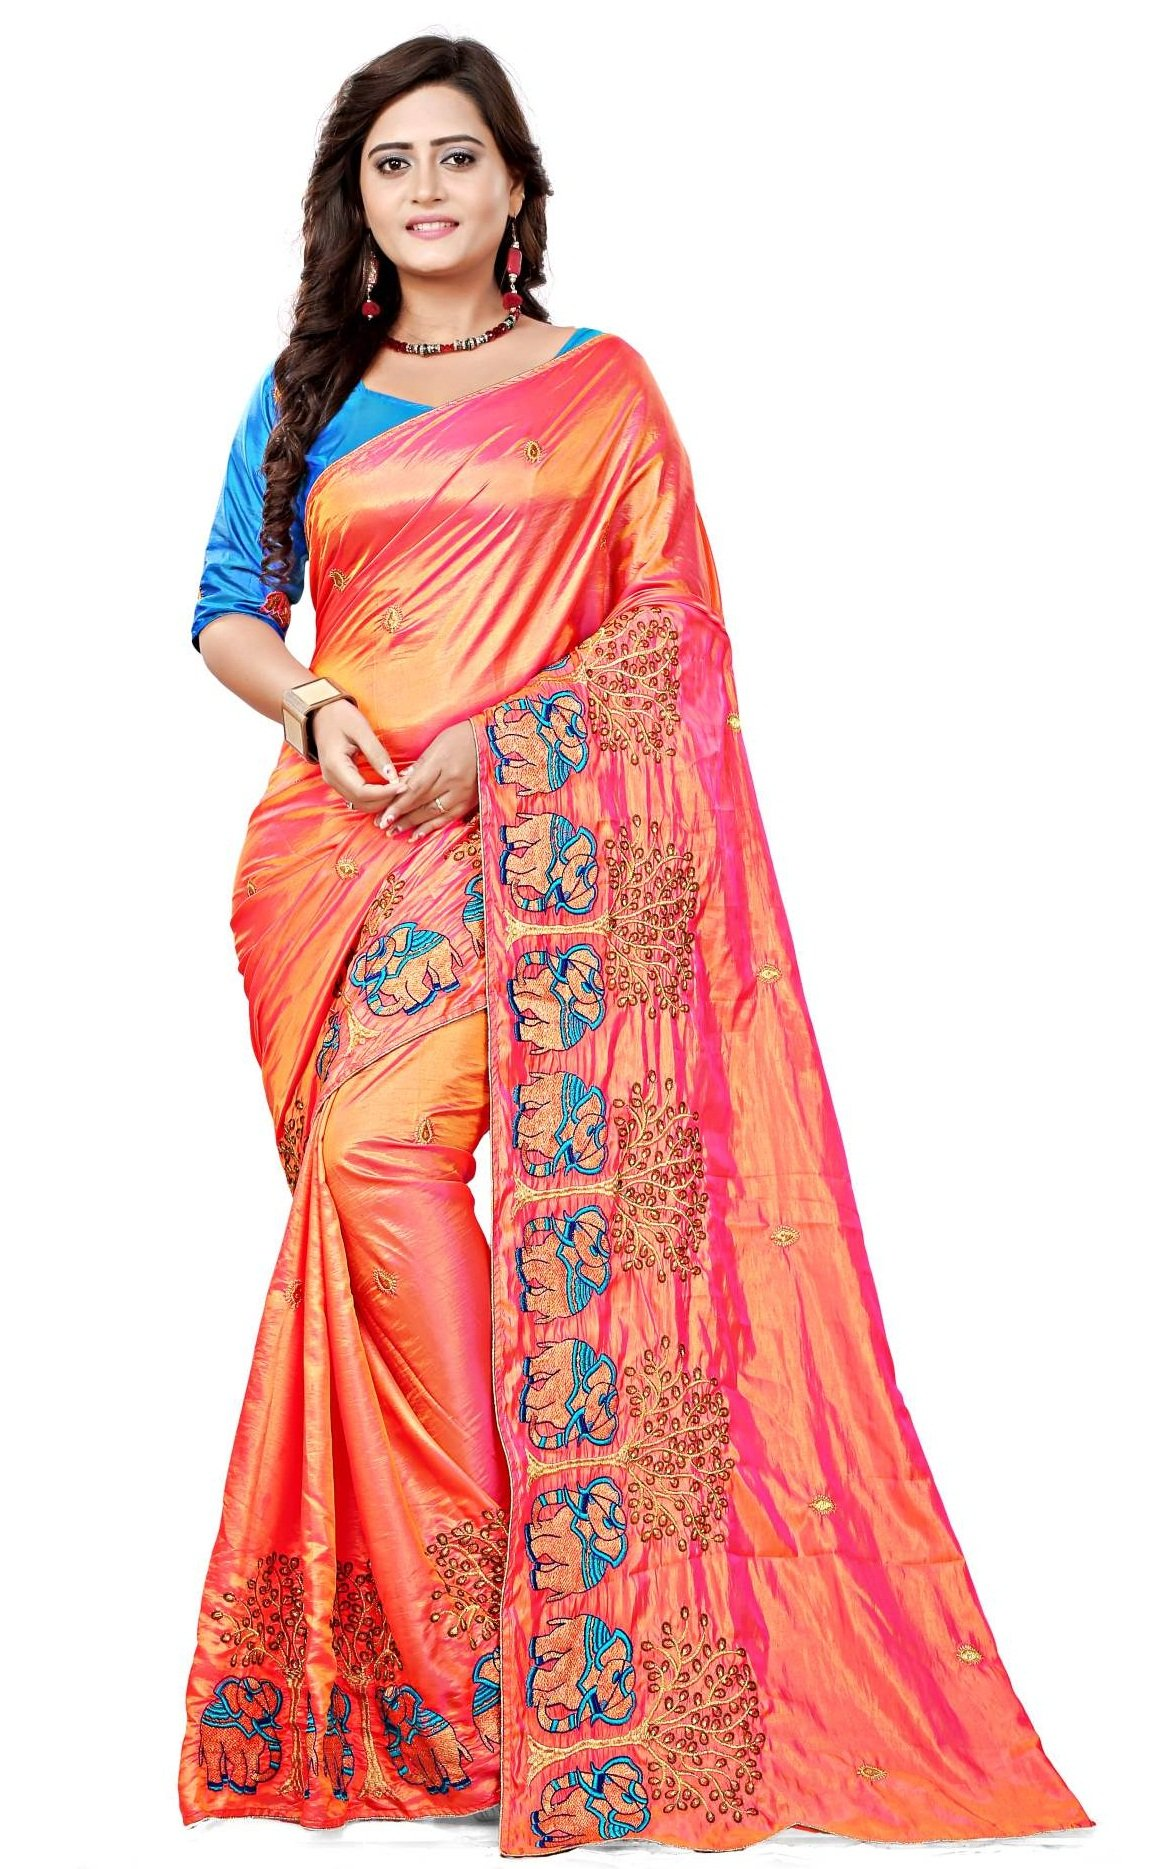 62540525e64966 Kuvarba Fashion Women s Silk Saree With Blouse Piece (3001  Pink  Free Size)